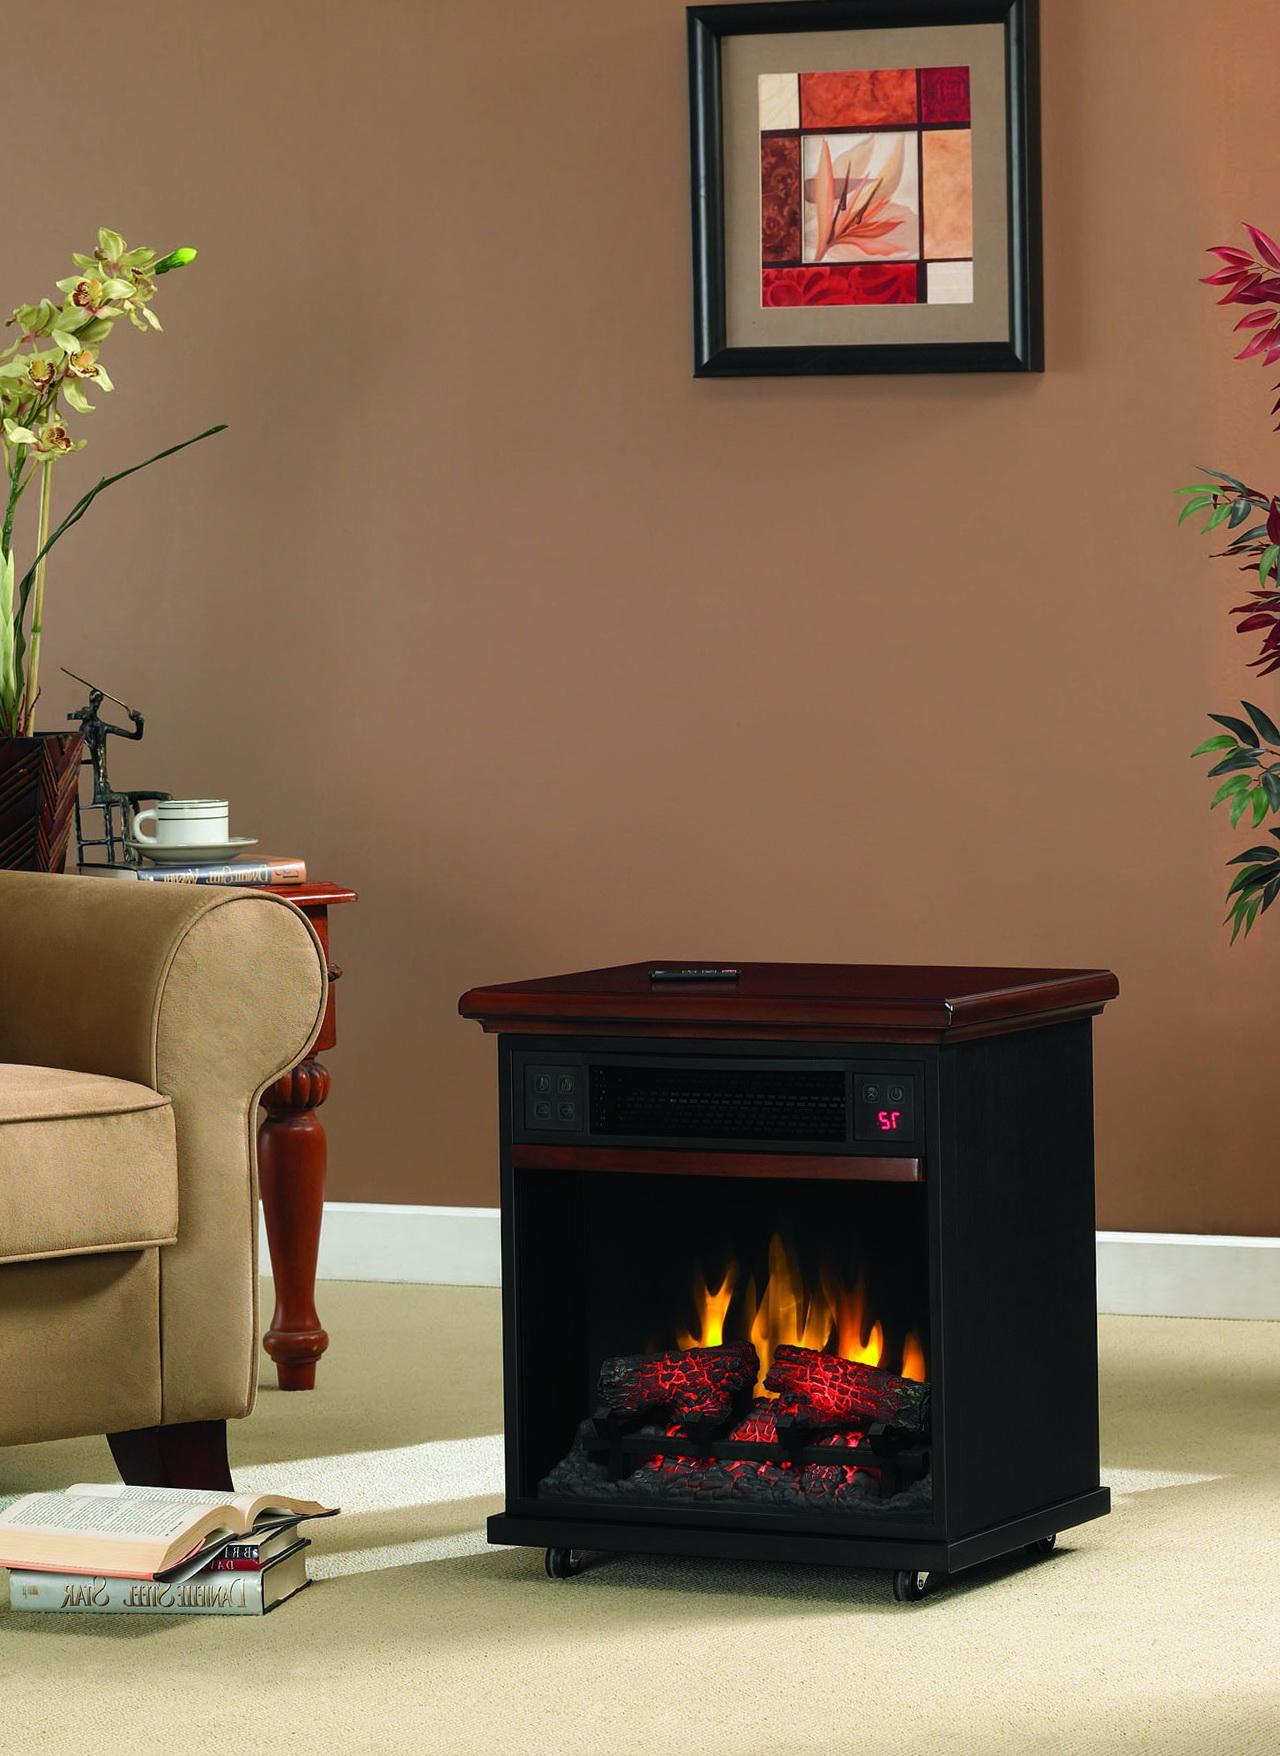 Twin Star Electric Fireplace 23ef010gaa Home Design Ideas